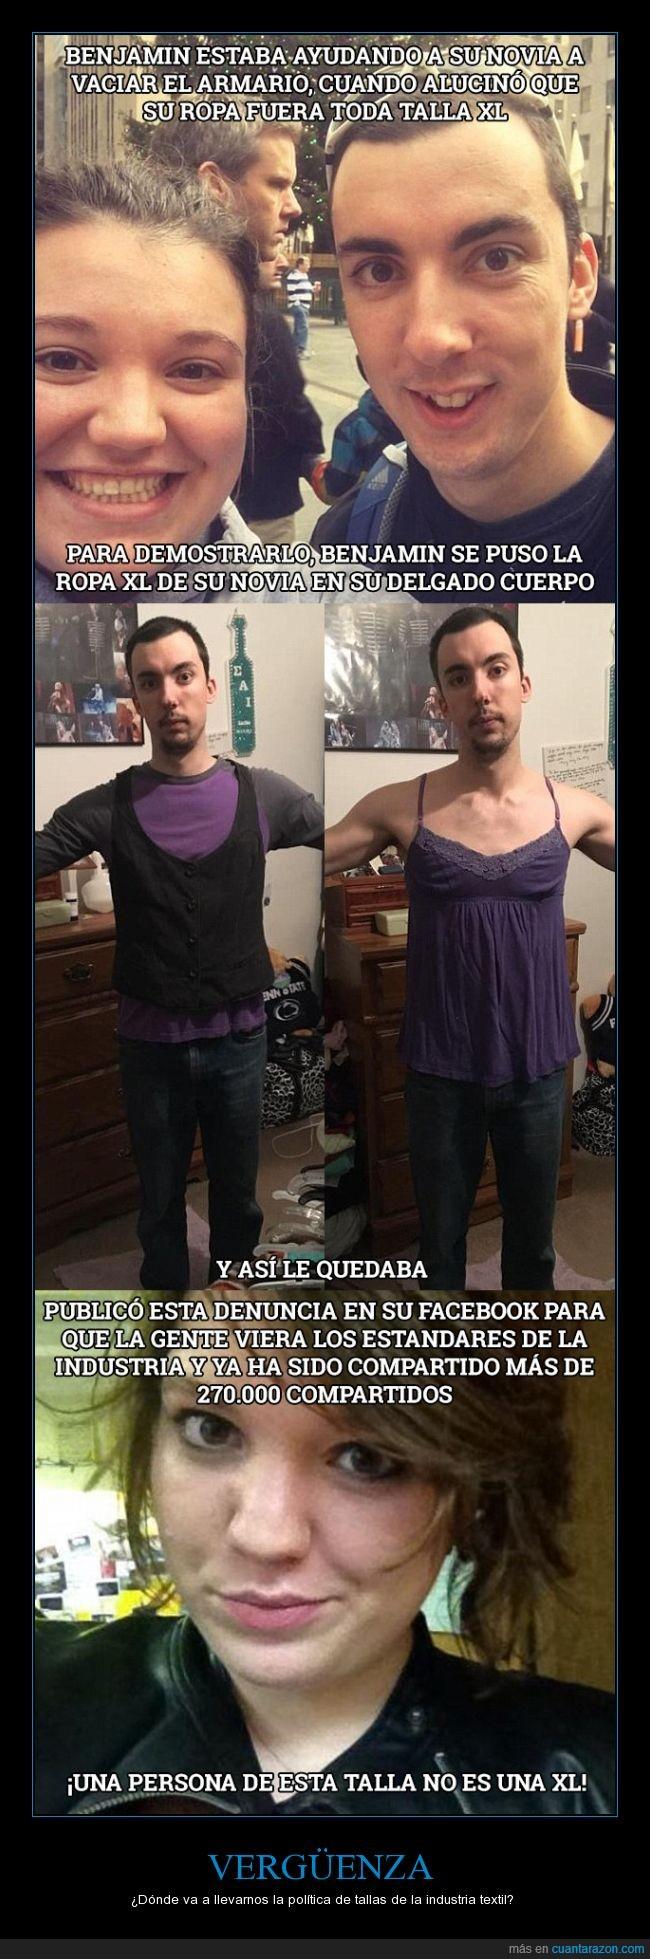 benjamin,gorda?,industria textil,novia,ropa,talla XL,vergüenza,XL